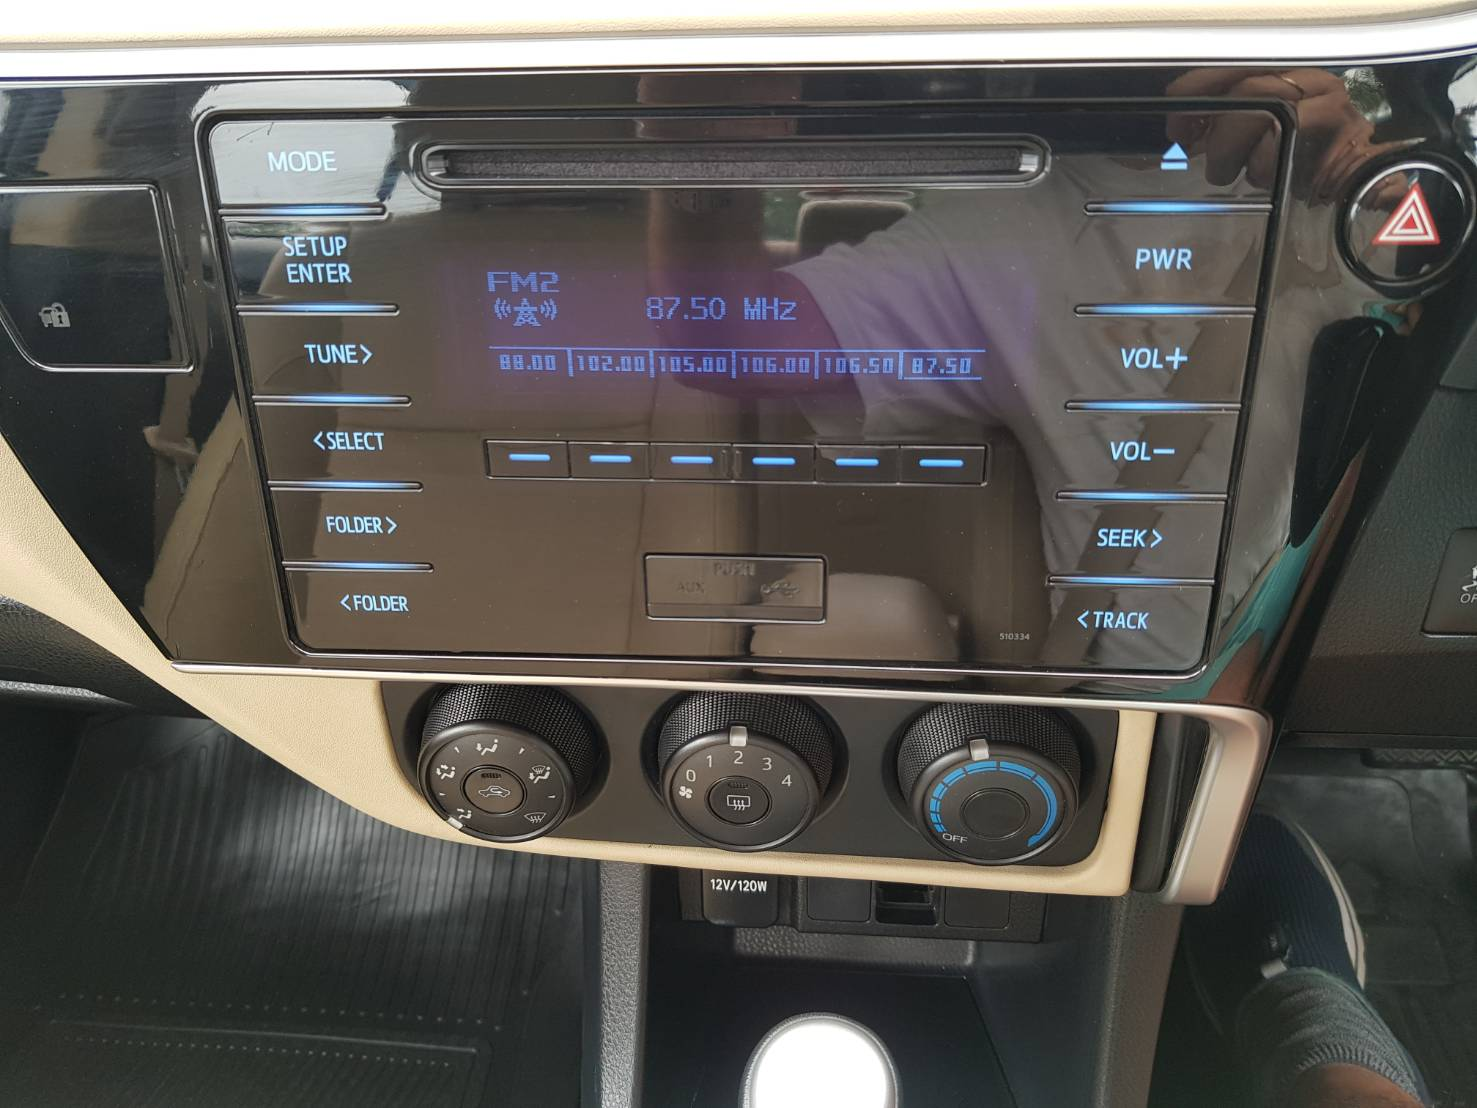 Toyota_Altis_1.6G_2019 (36)